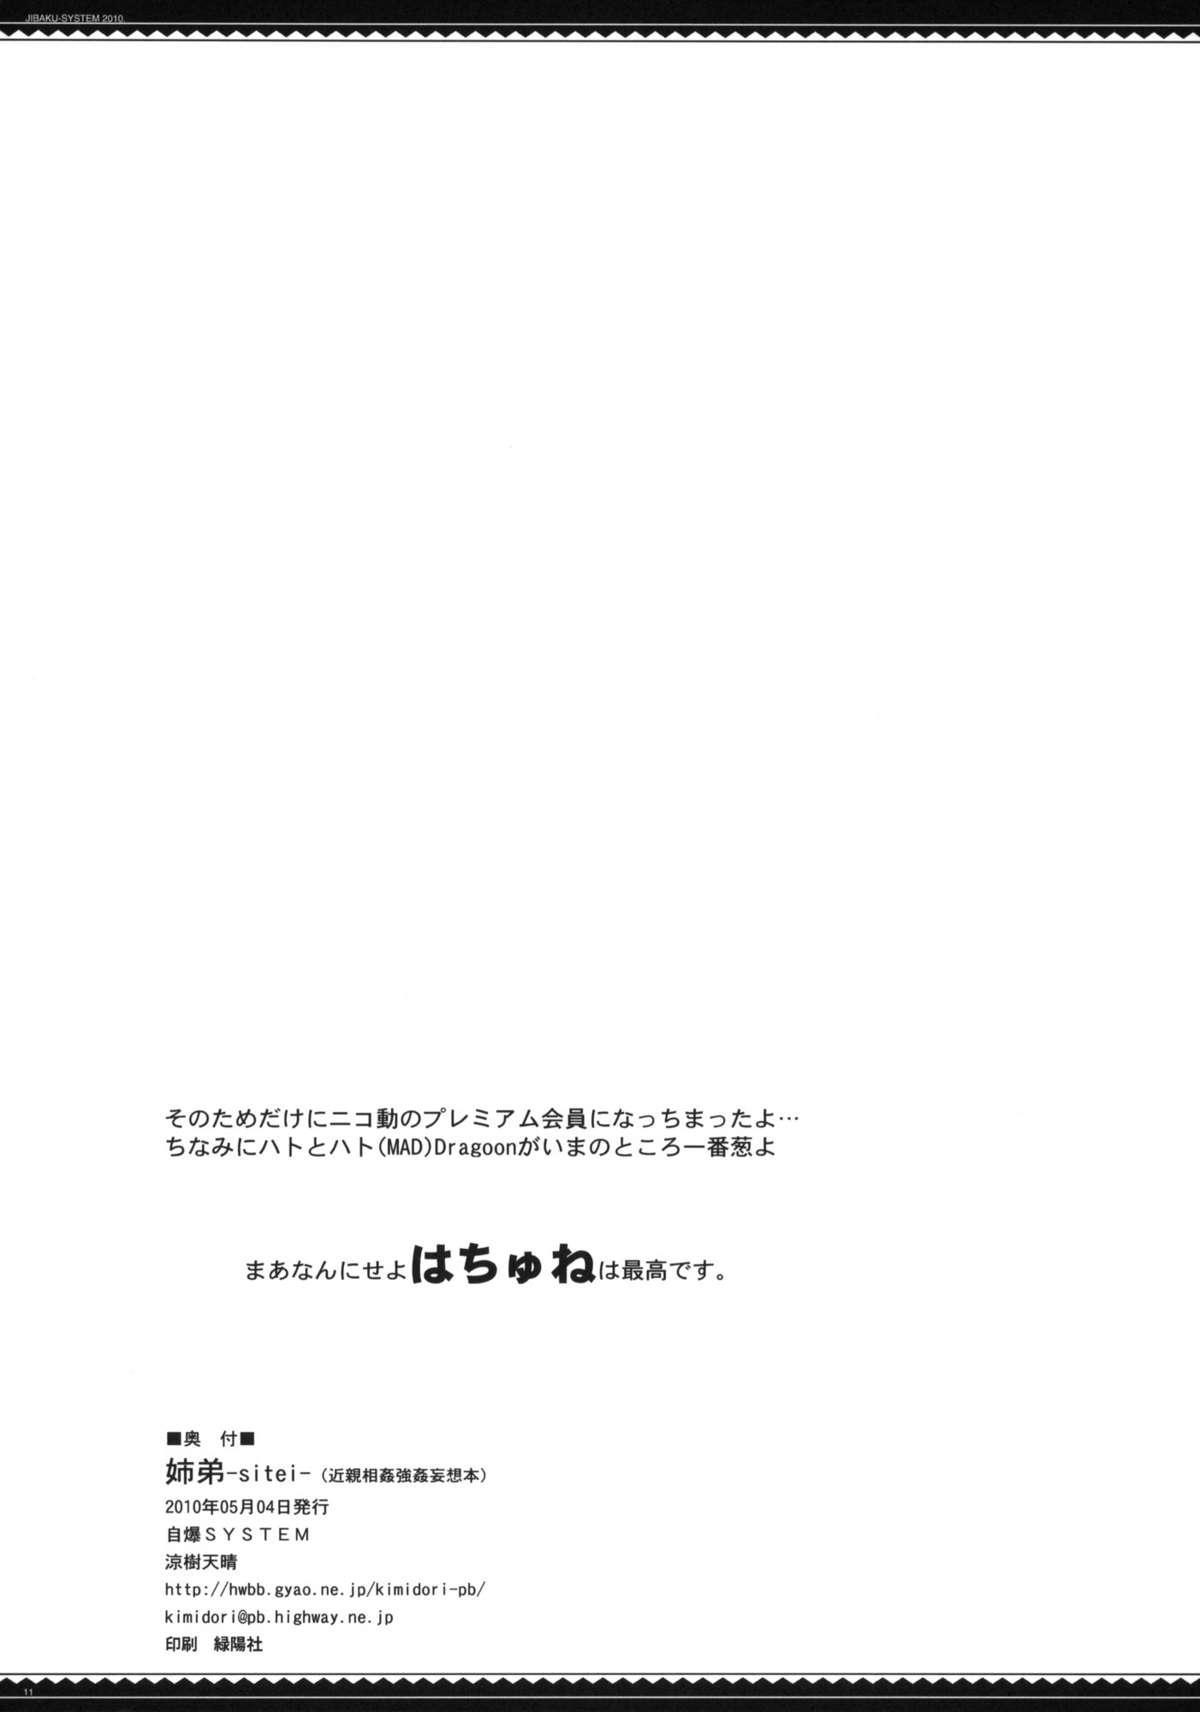 (COMITIA92)[JIBAKU SYSTEM] Sitei-sitei- Kinshin Soukan Goukan Mousouhon (Original) 10